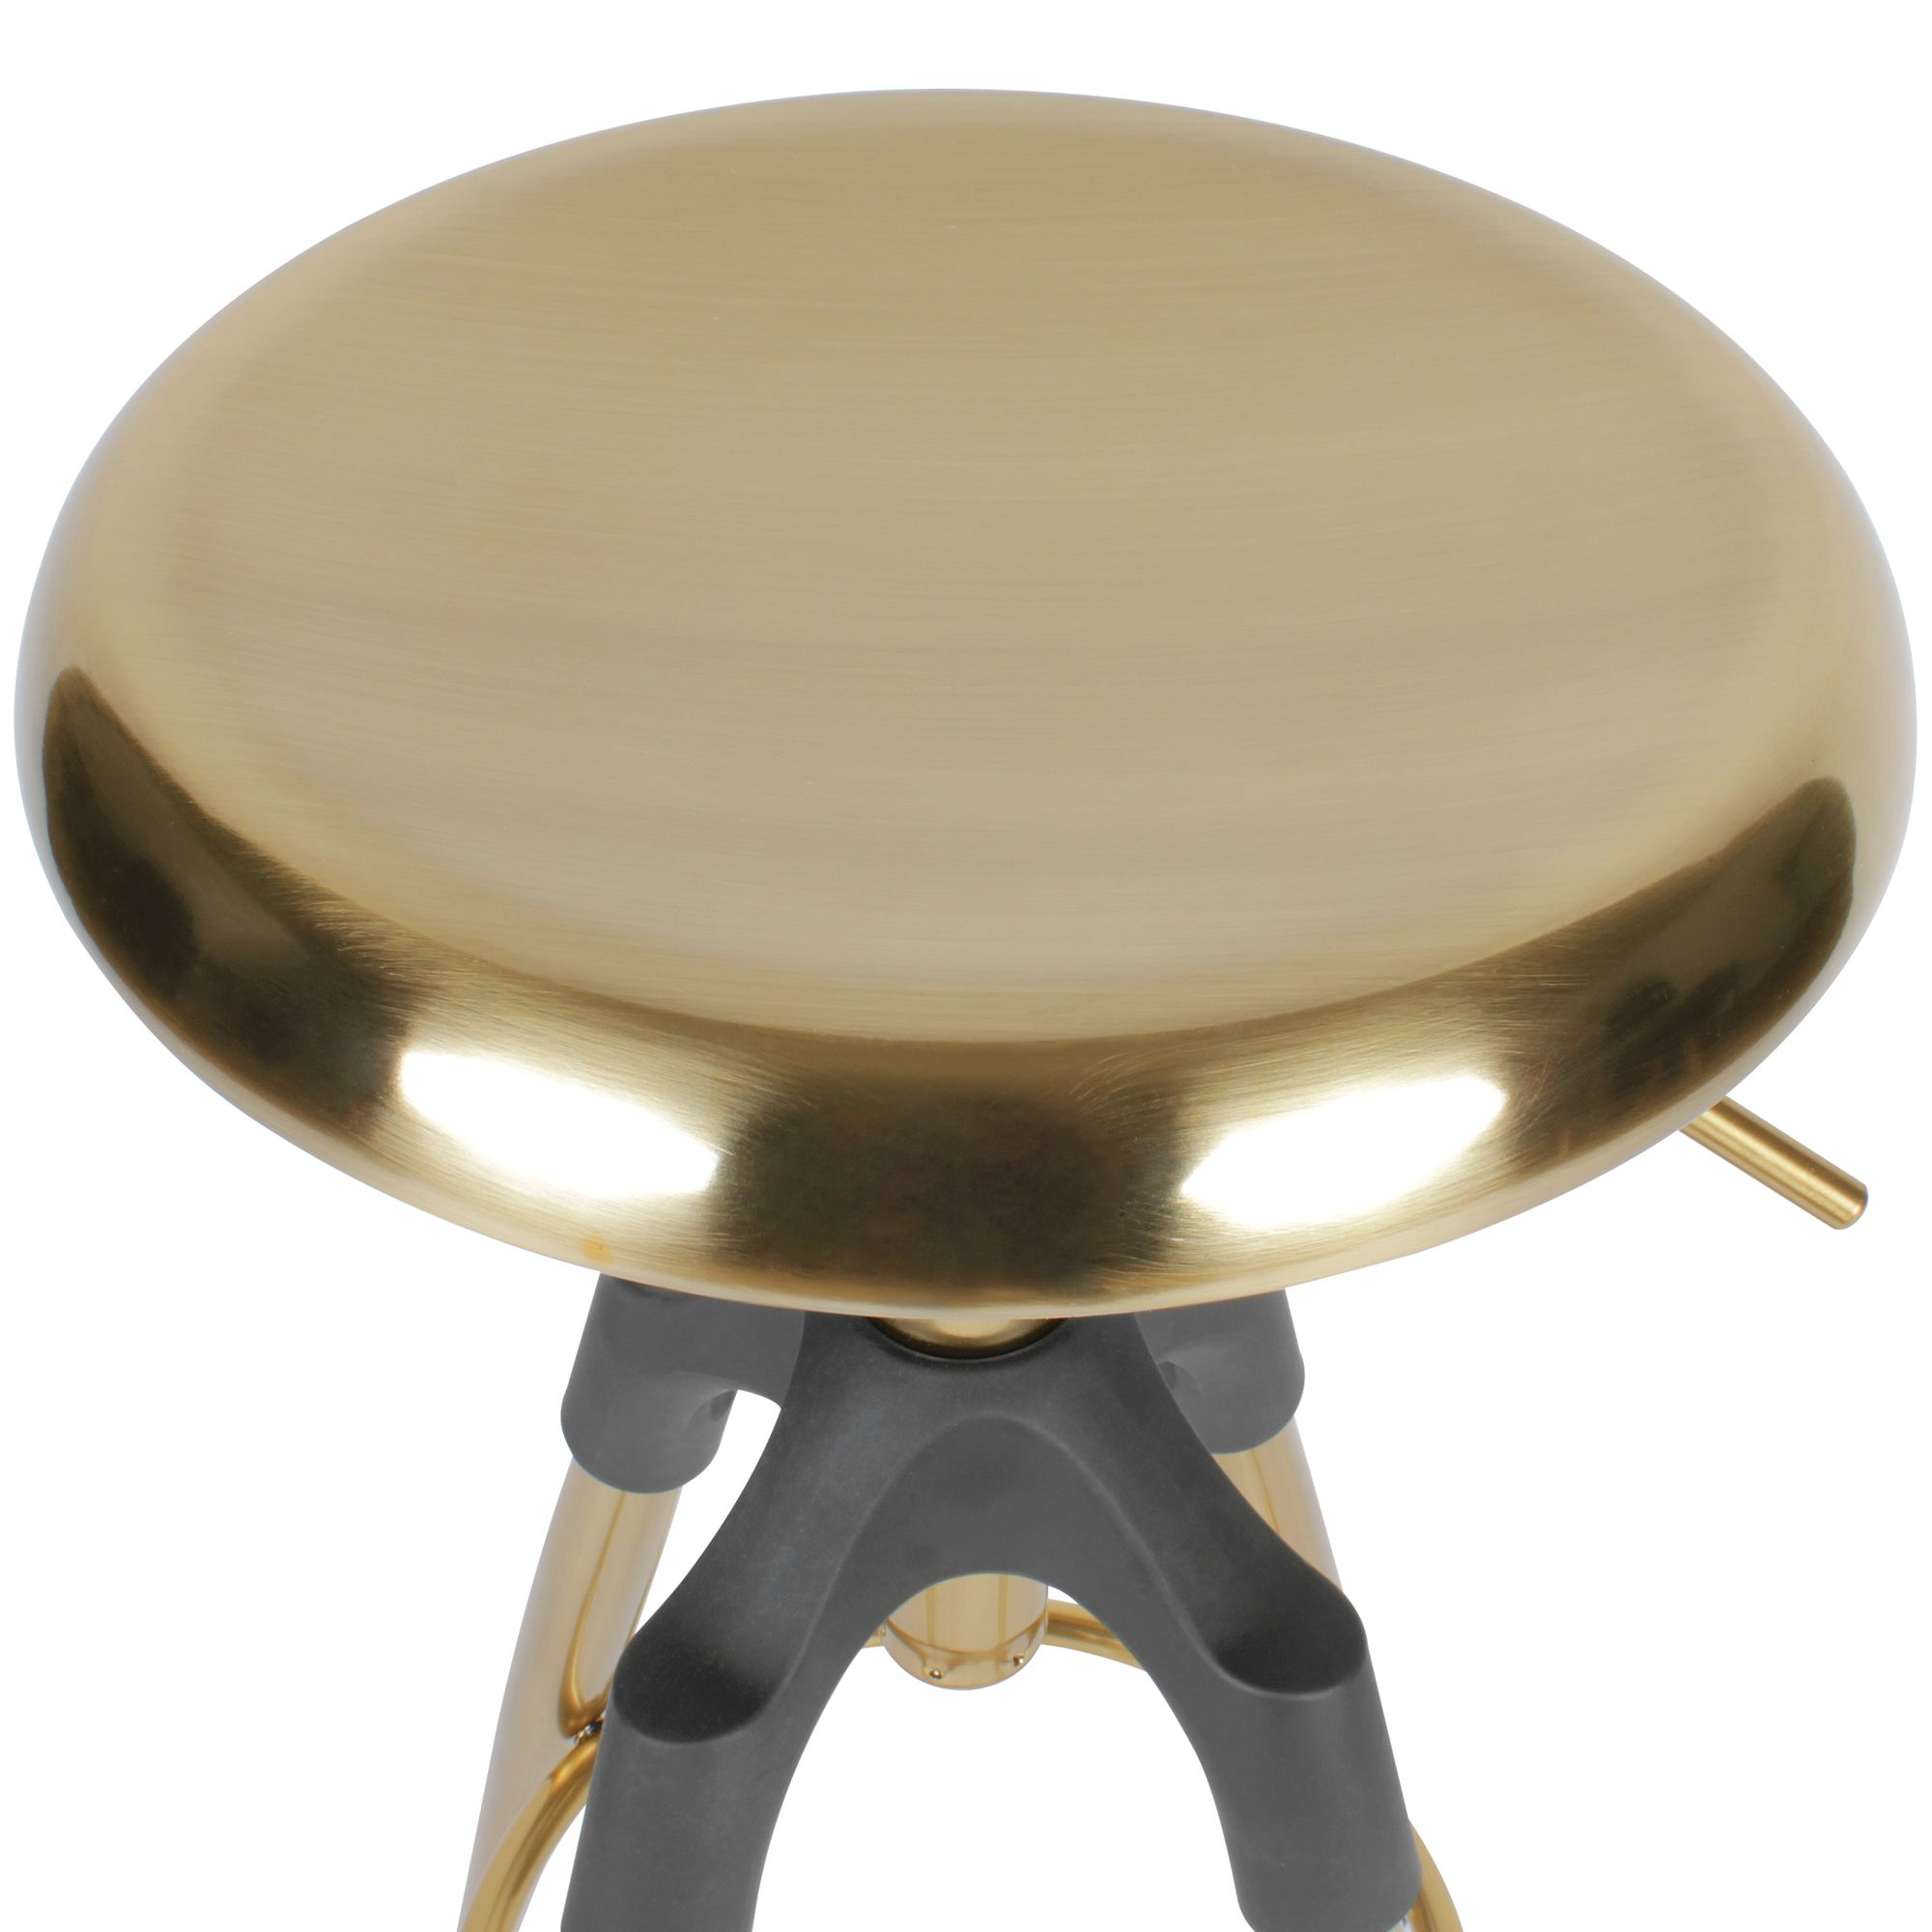 Wohnling Barhocker Gold Metall 72 80 Cm Design Barstuhl 100 Kg Maximalbelastbarkeit Tresenhocker Industrial